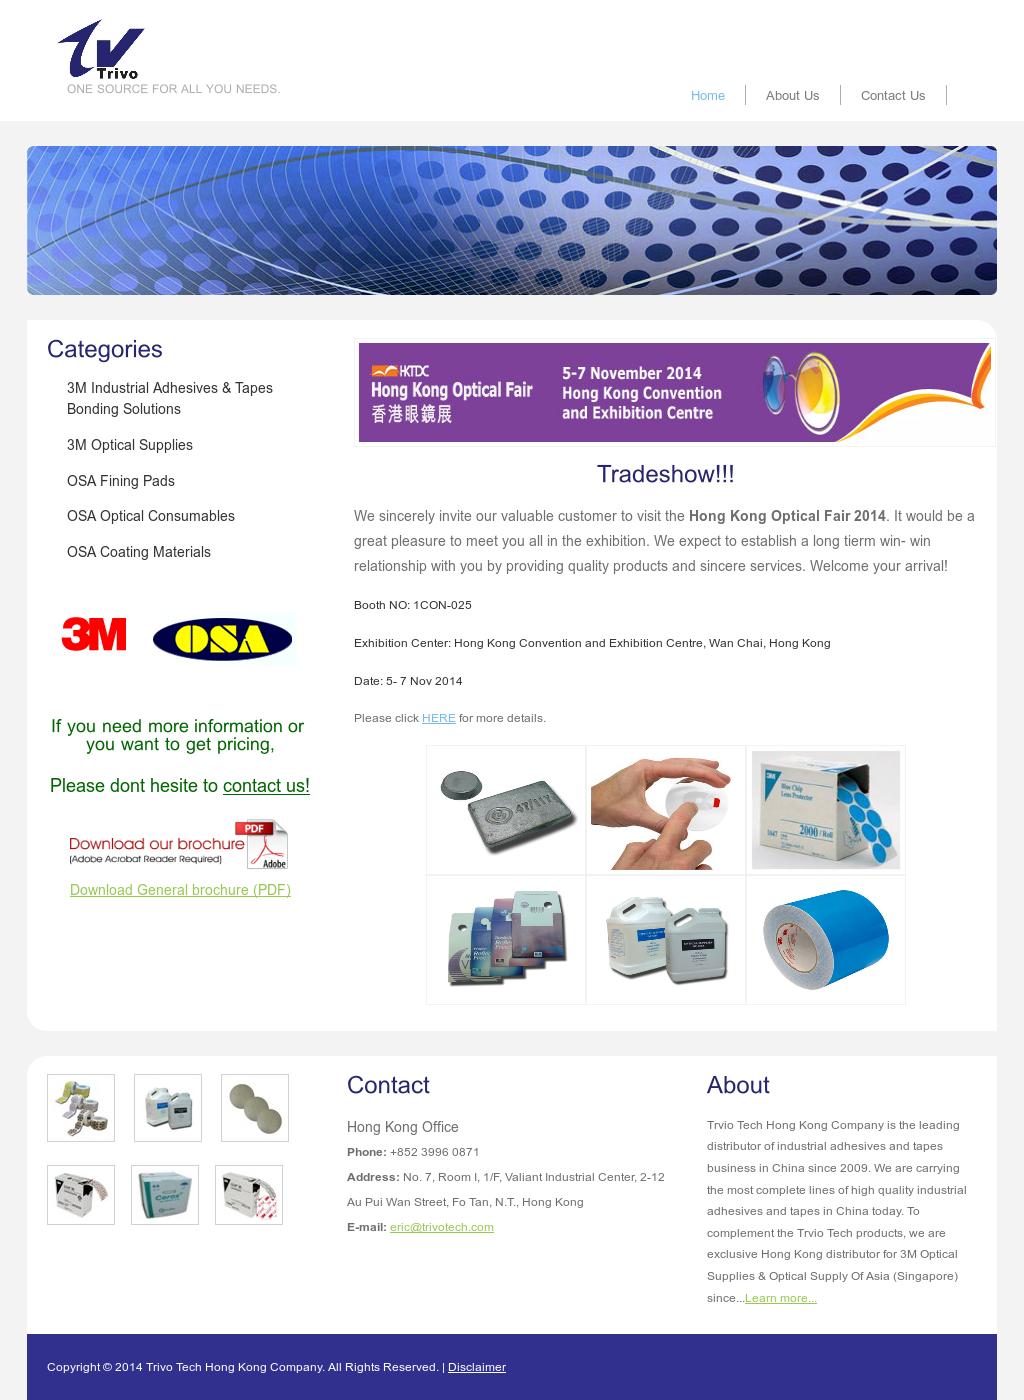 Trivo Tech Hong Kong Company Competitors, Revenue and